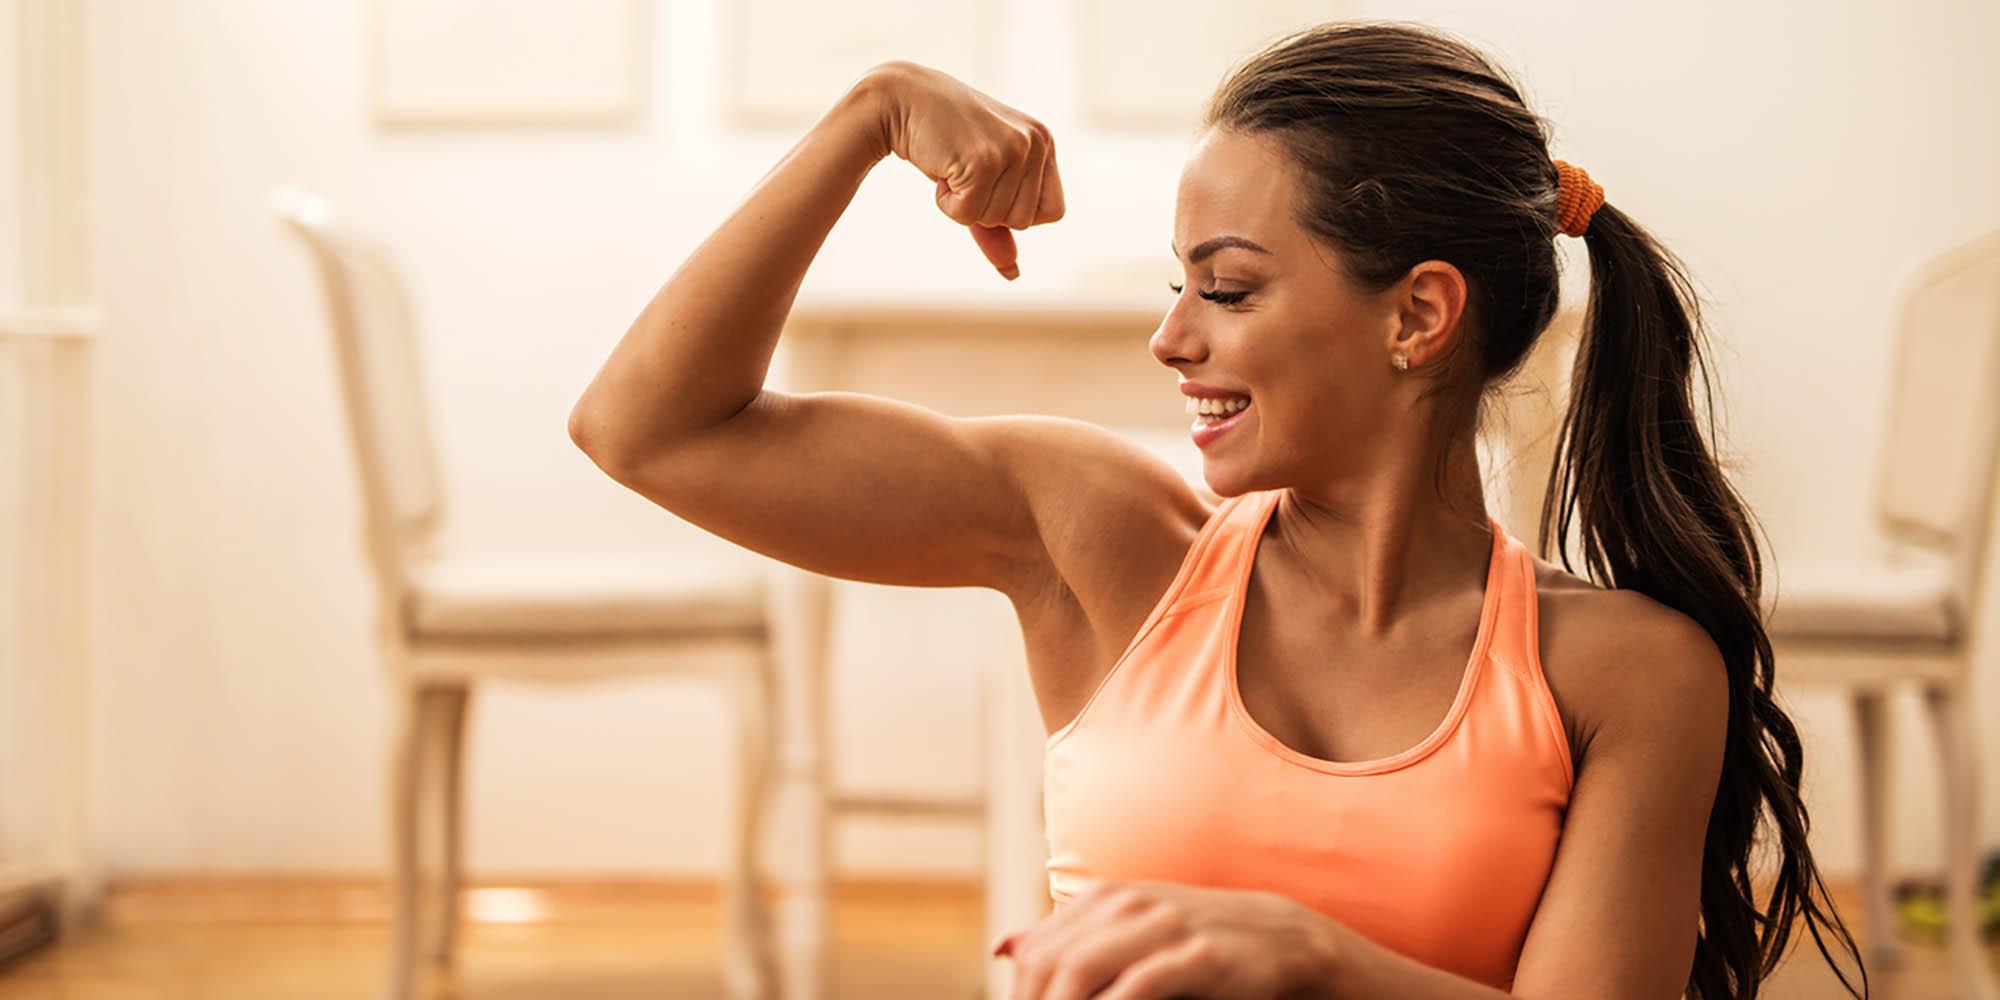 5 Non-Scale Victories That Prove You're Making Progress